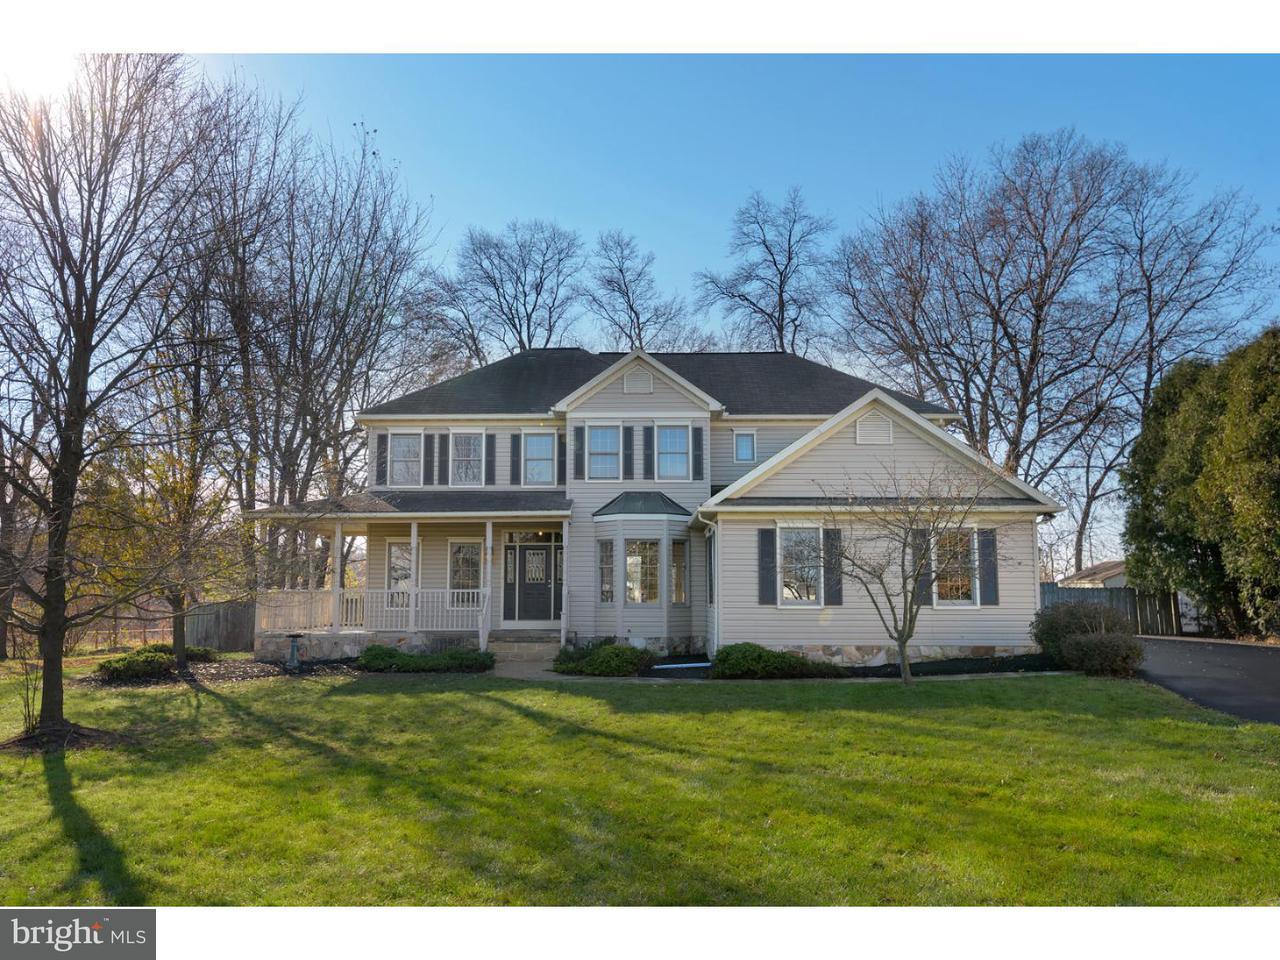 Single Family Home for Sale at 374 W WALNUT TREE Drive Blandon, Pennsylvania 19510 United States